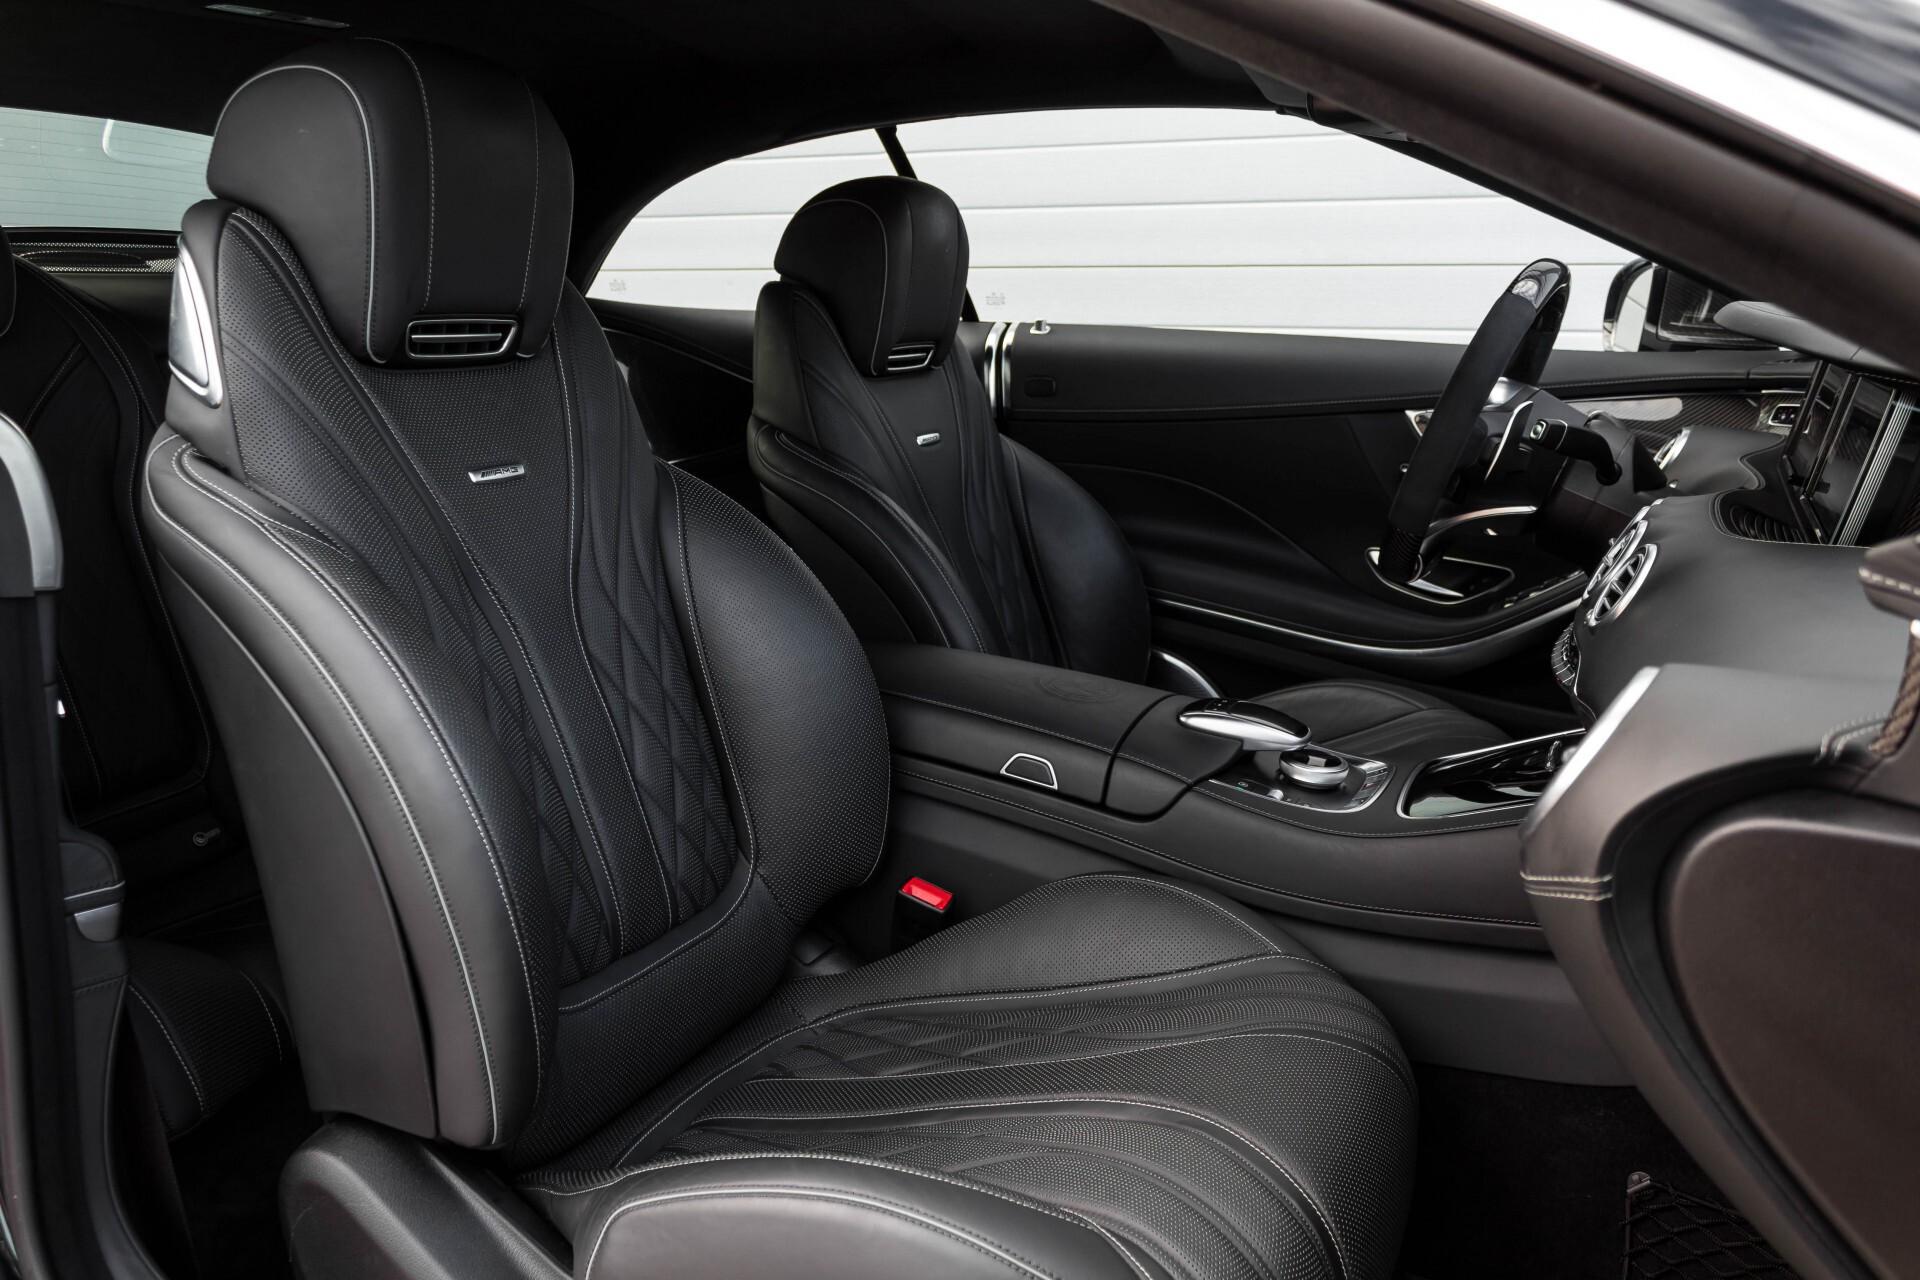 Mercedes-Benz S-Klasse Cabrio 63 AMG 4-M Ceramic/Designo/Carbon/Burmester High End Aut Foto 5